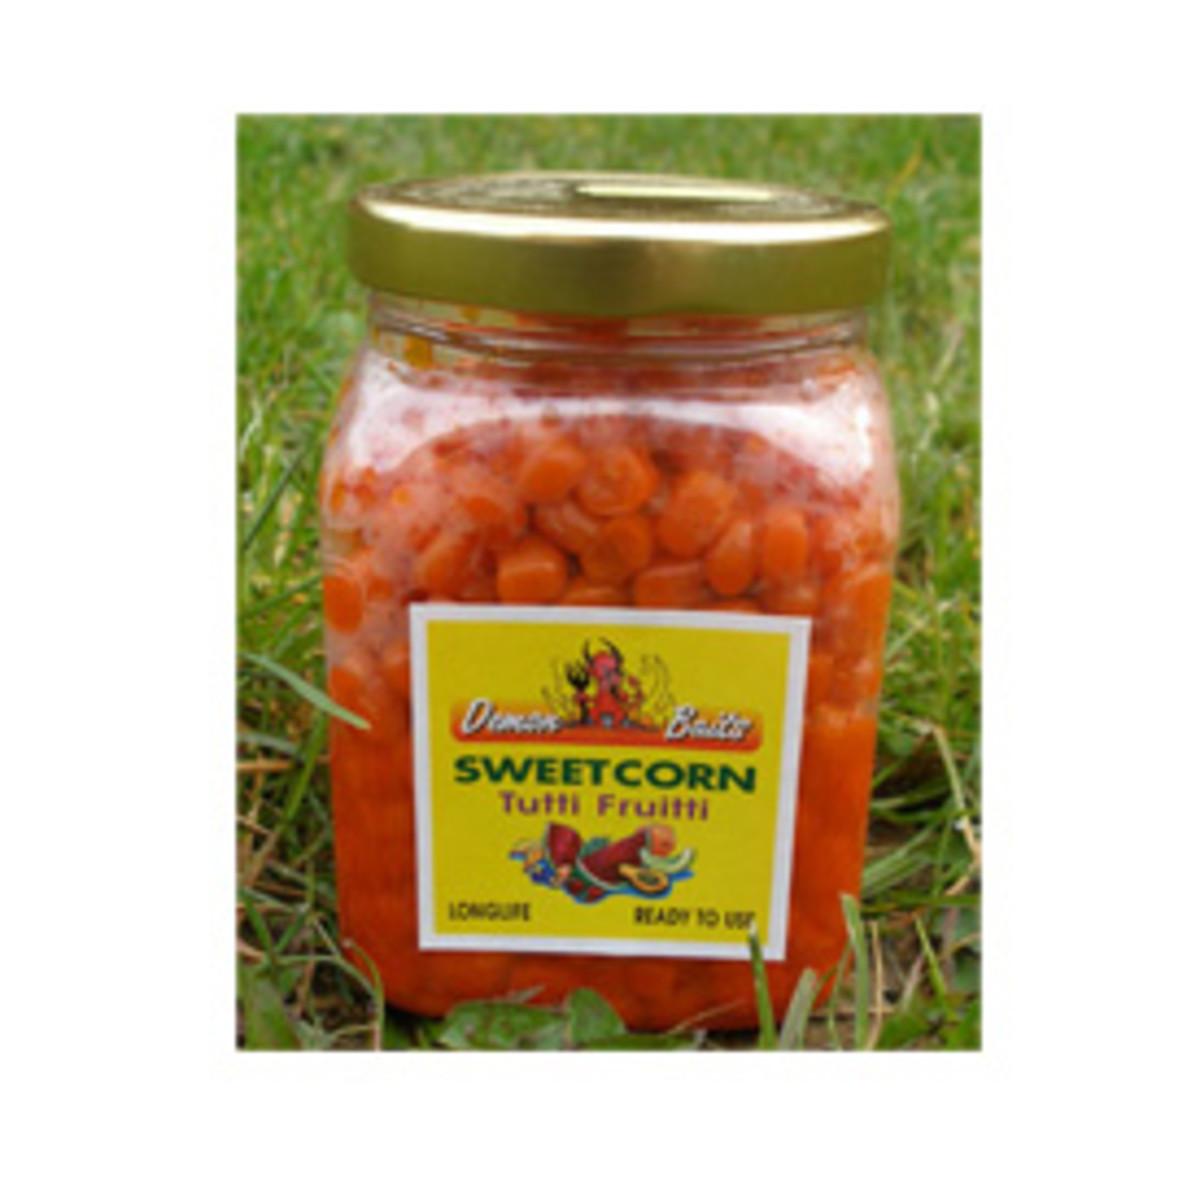 Flavoured Sweetcorn